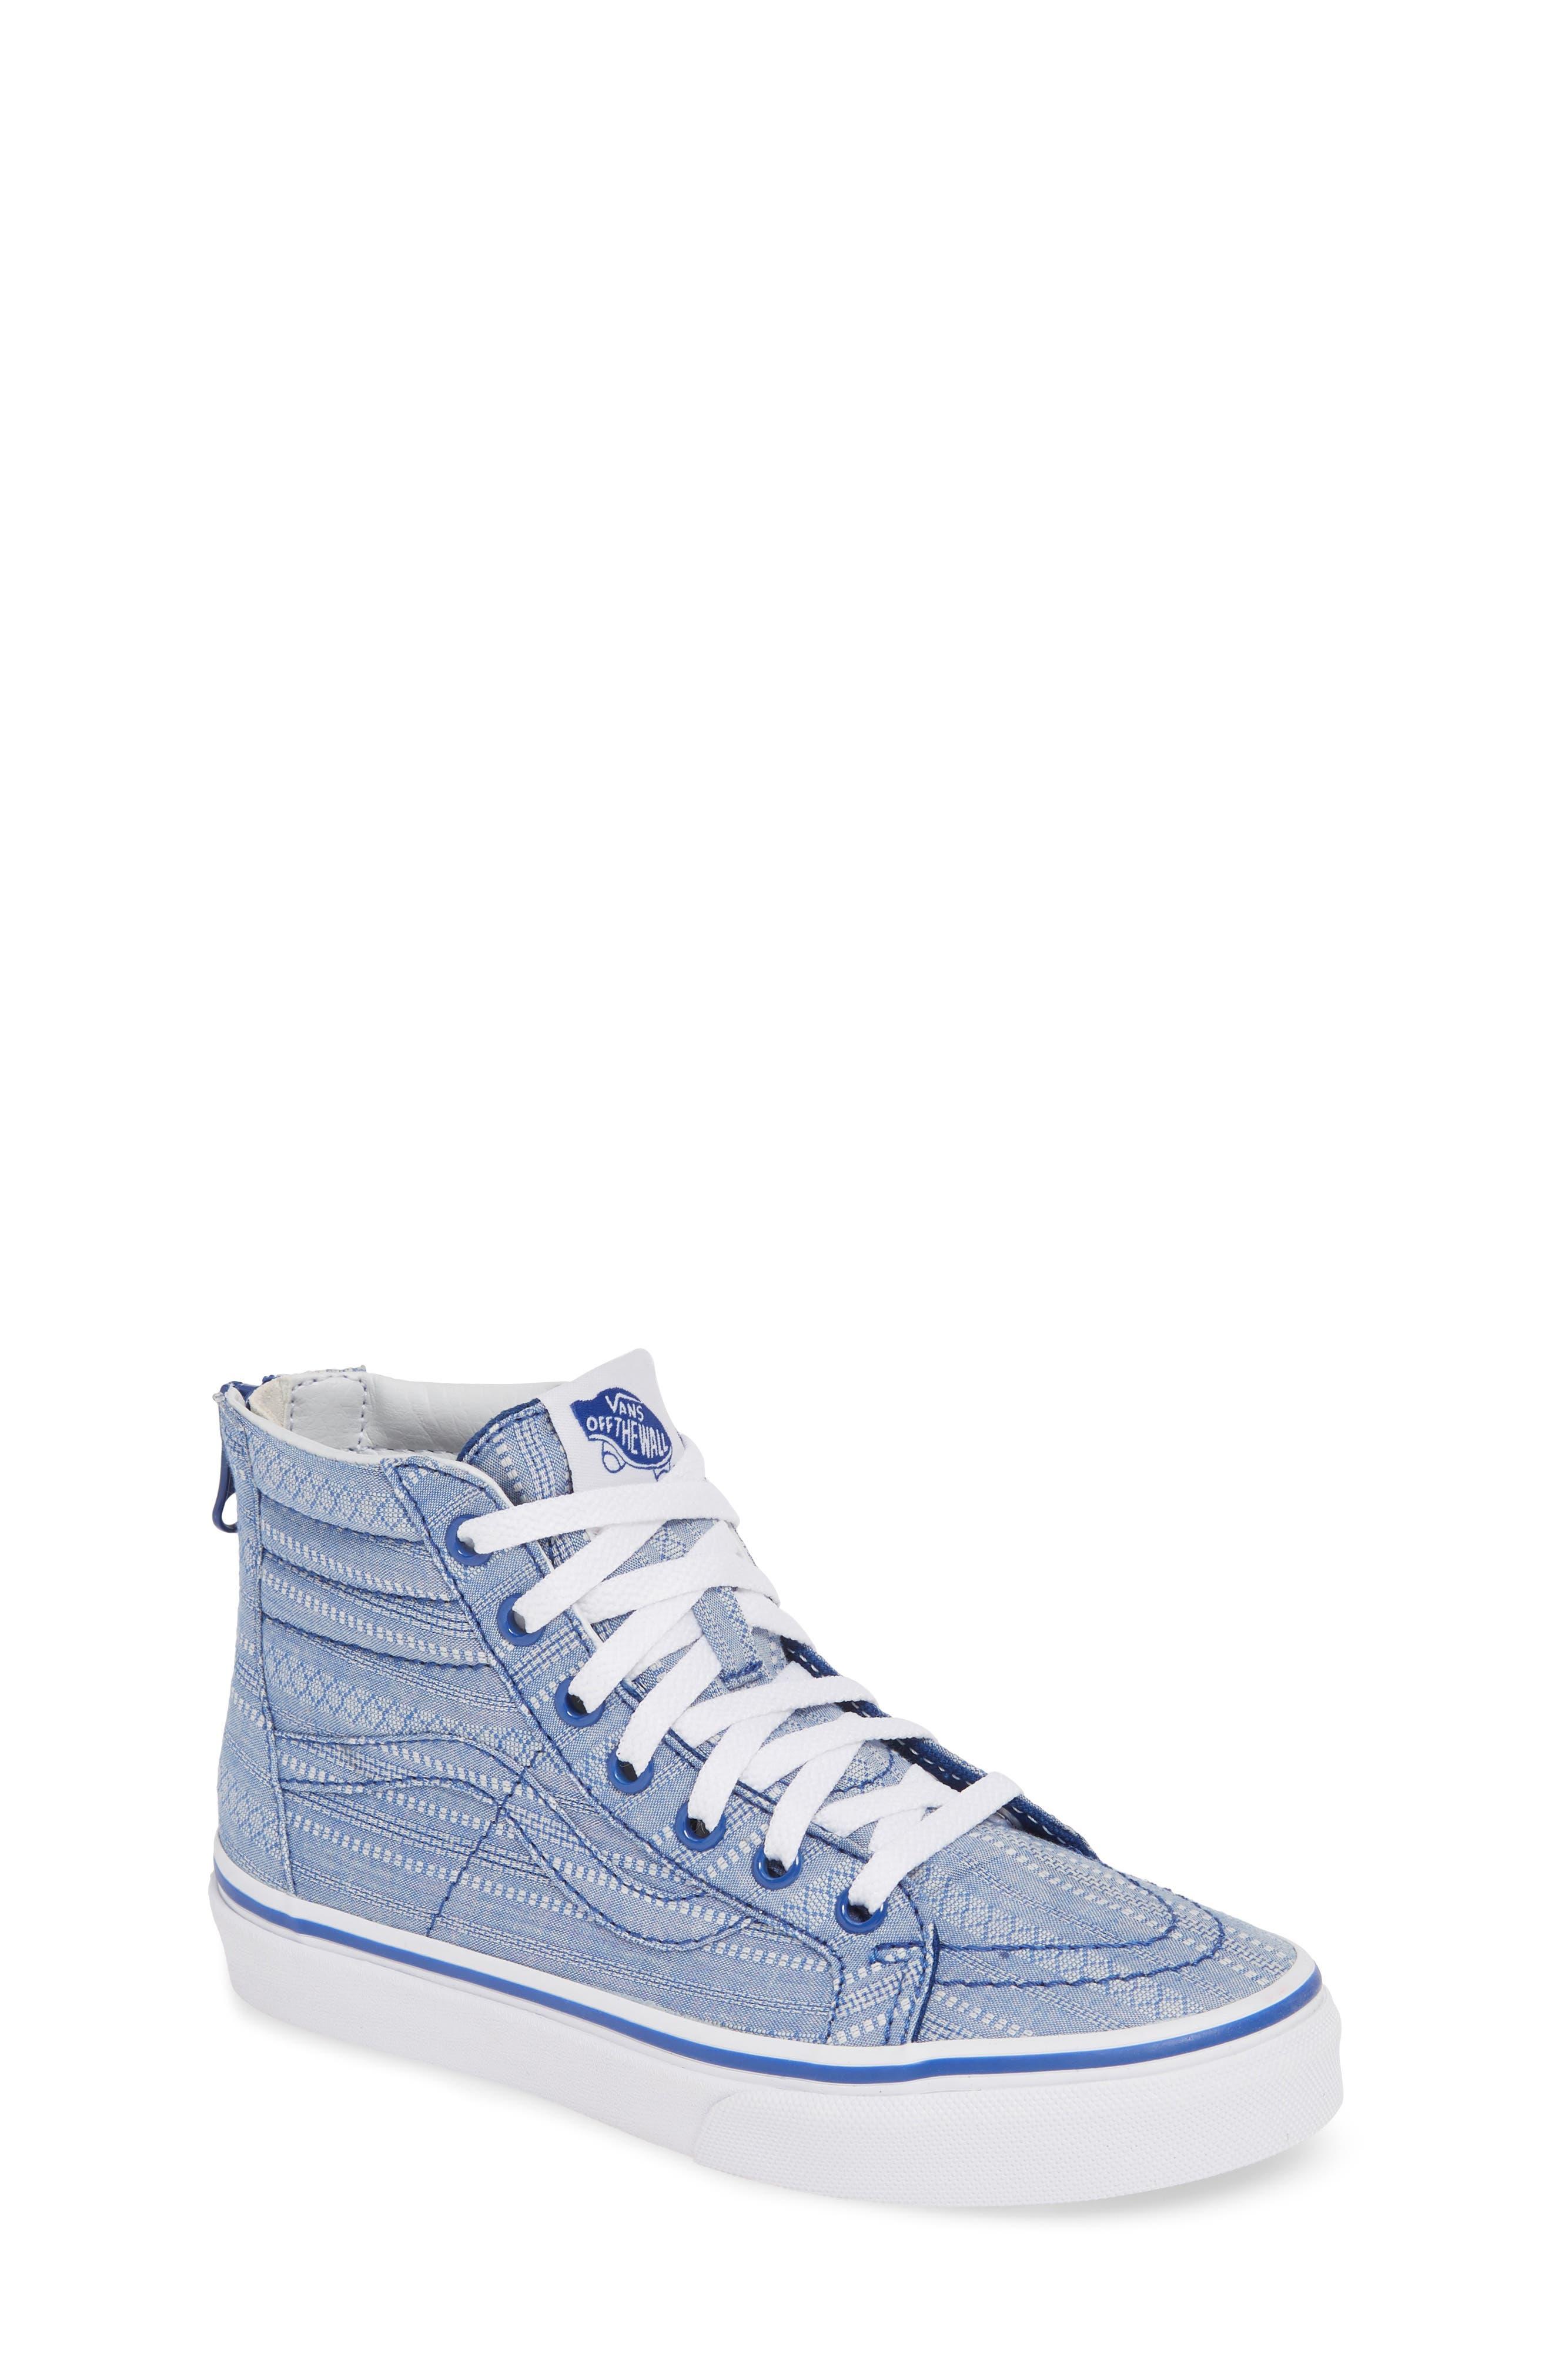 VANS Sk8-Hi Zip Sneaker, Main, color, TRUE BLUE/ TRUE WHITE